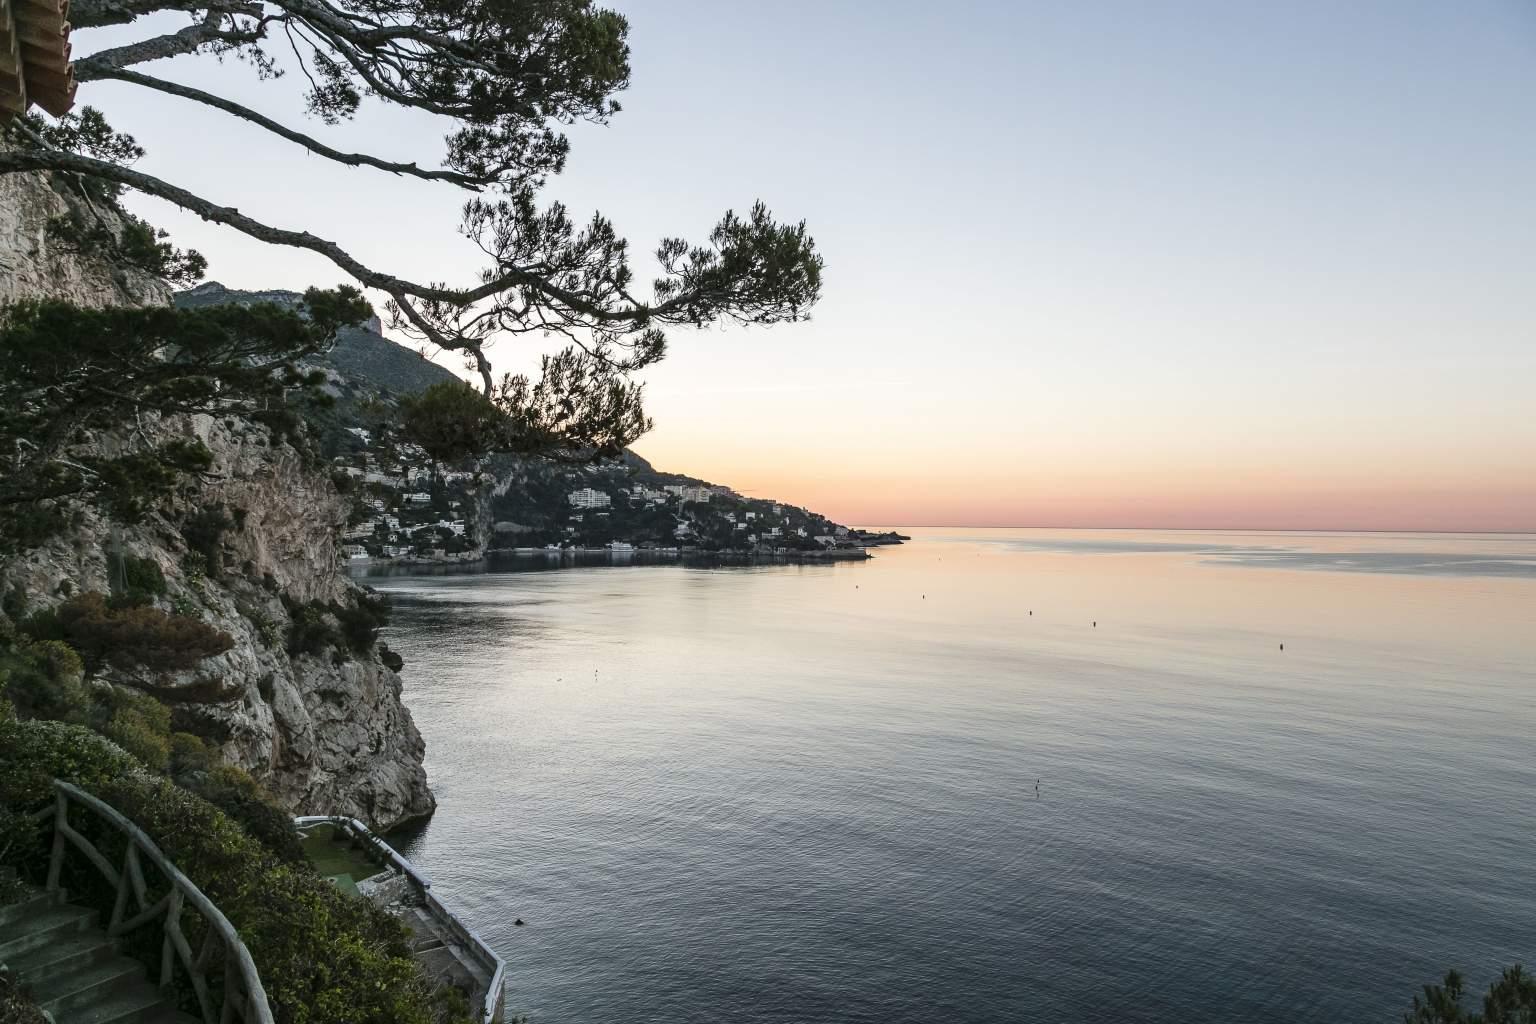 sea-view-french-riviera